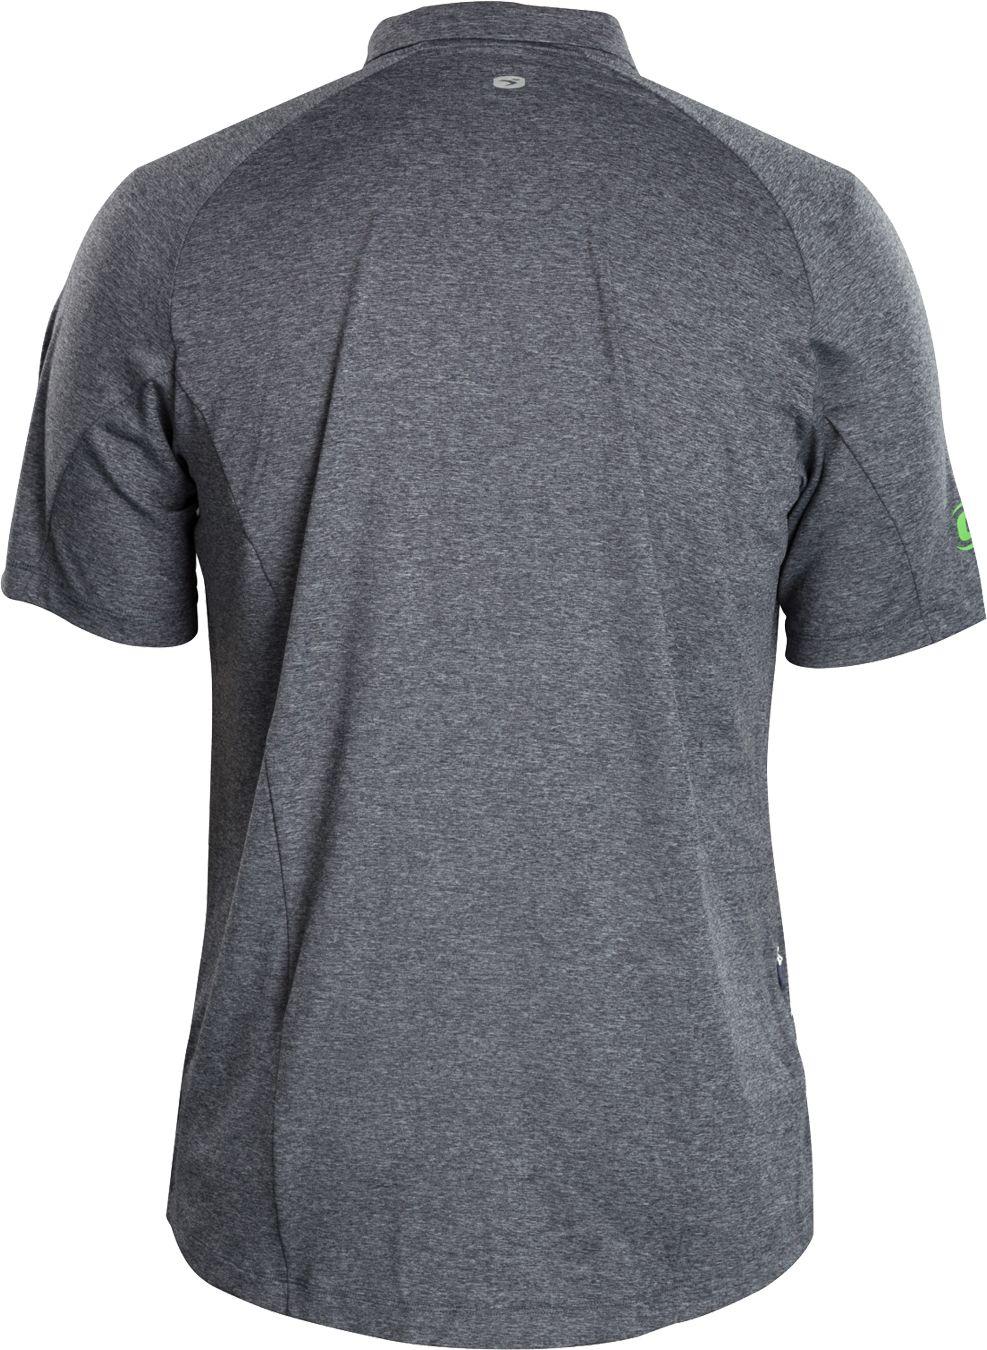 Sugoi Grey TrikotexpressCannondale Polo Online Coast Buy Shirt hrCQdBtsx